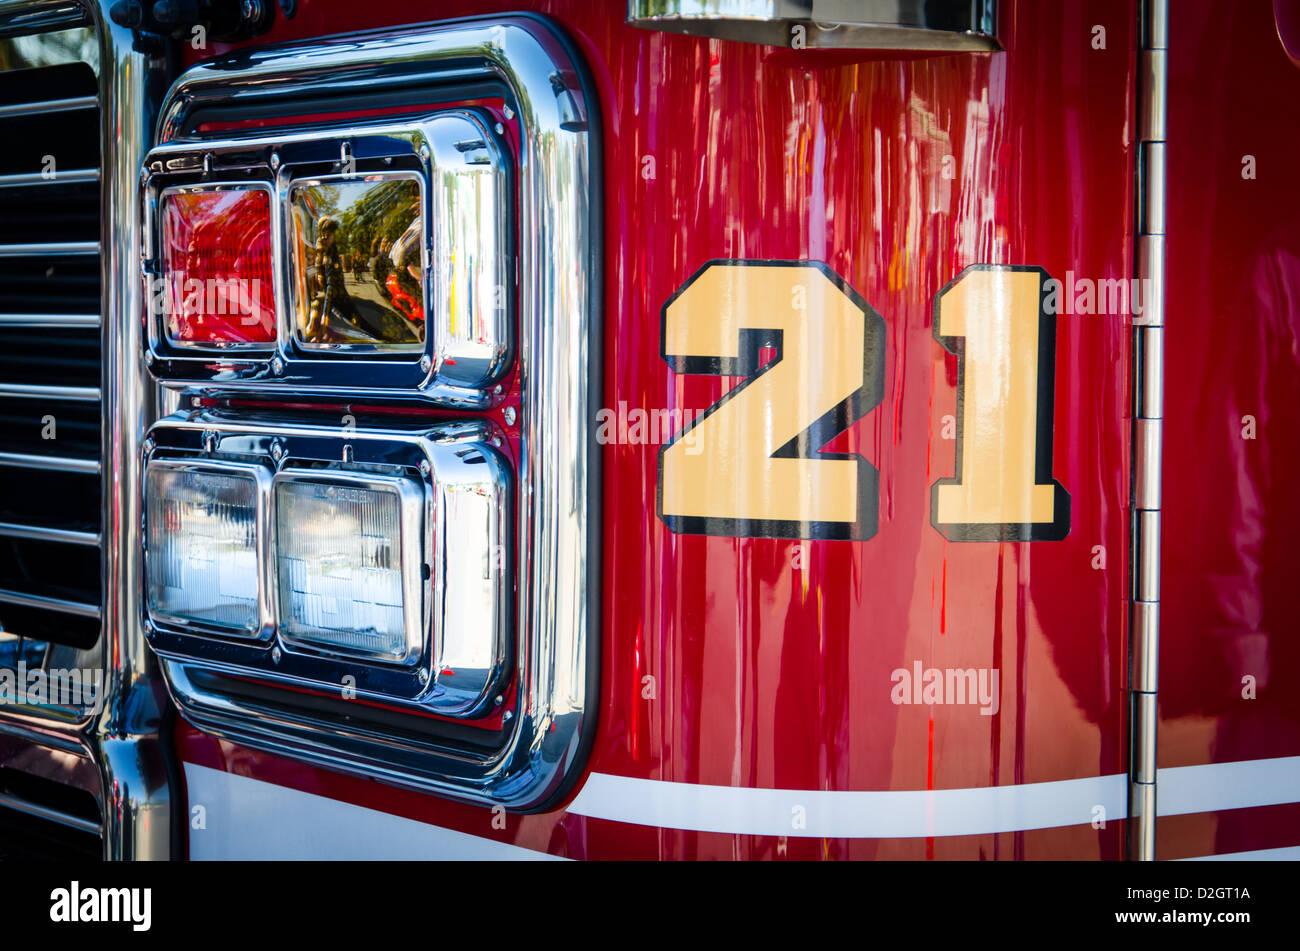 Engine No 21 at Ellicott City Volunteer Fire Department - Stock Image